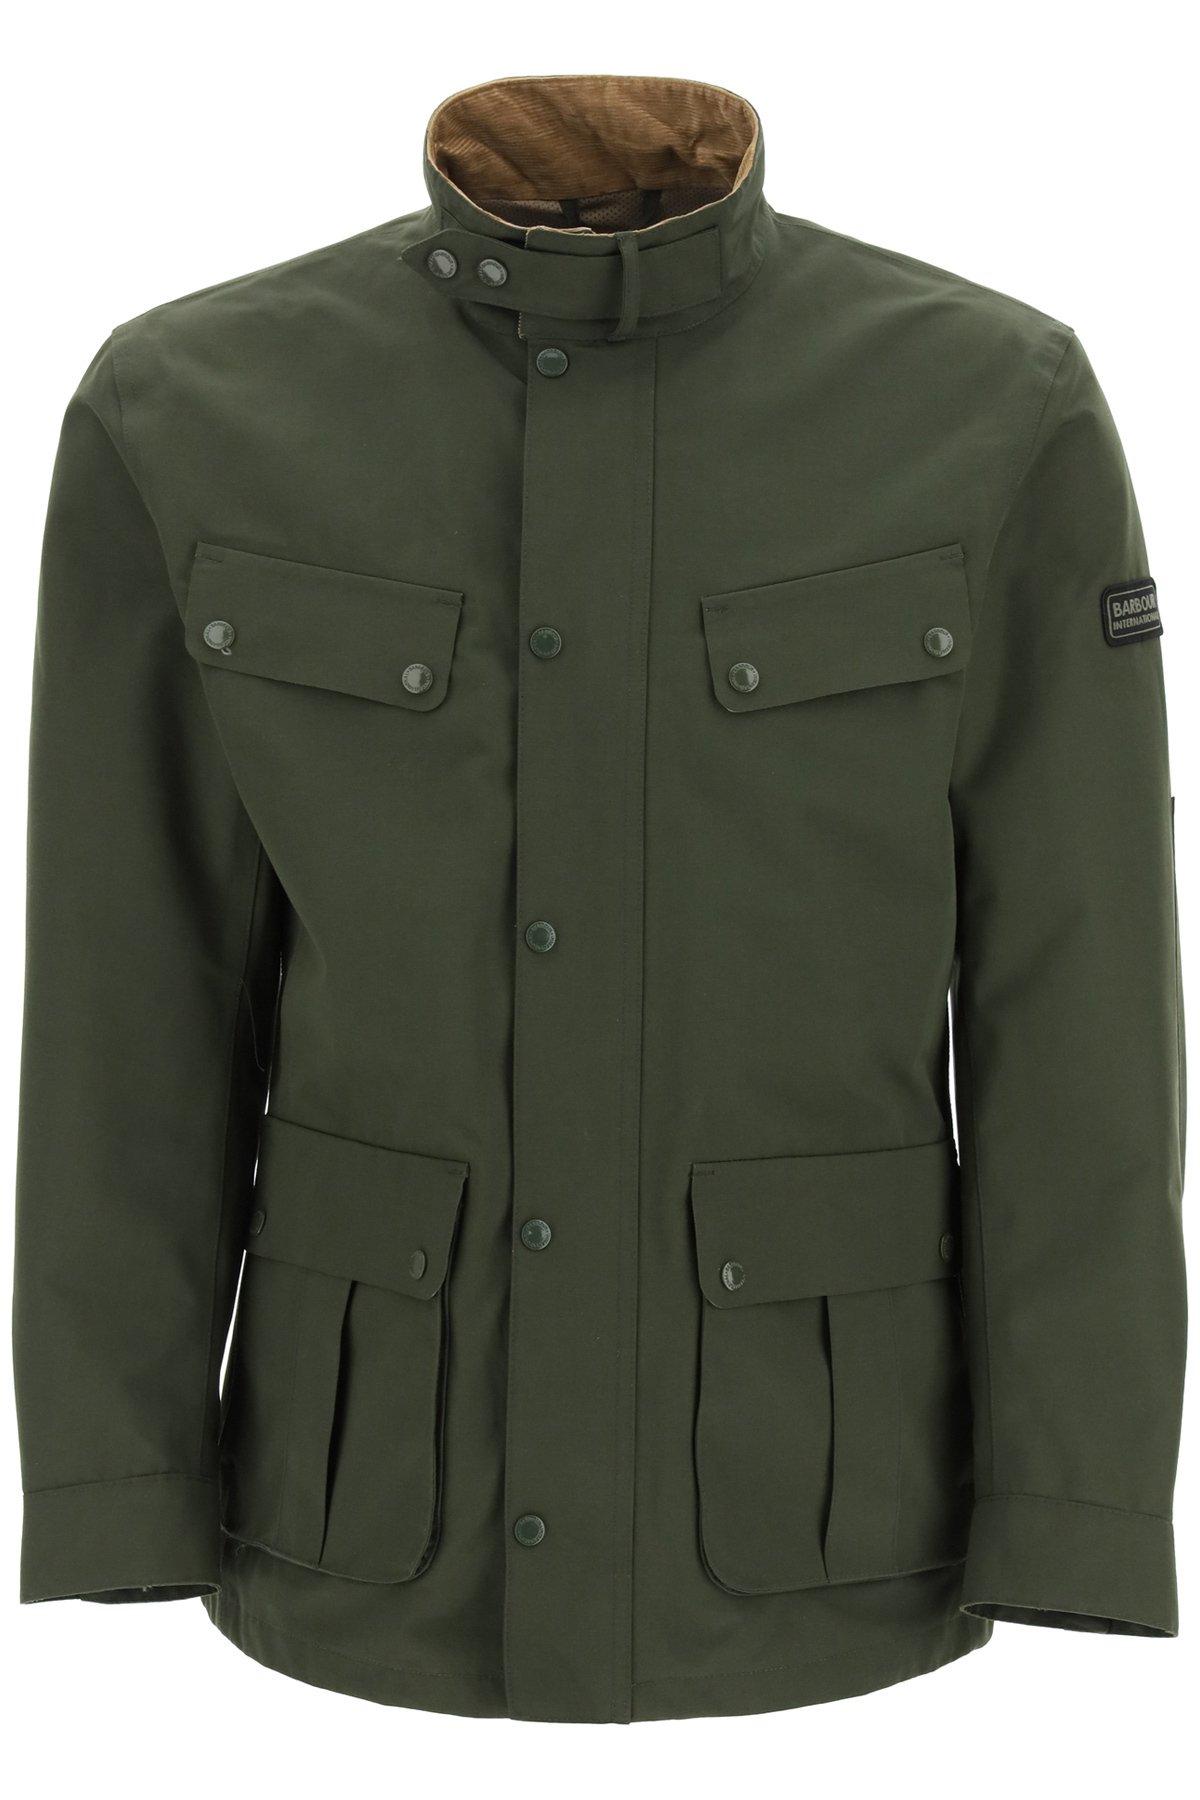 Barbour international giacca duke in waterproof